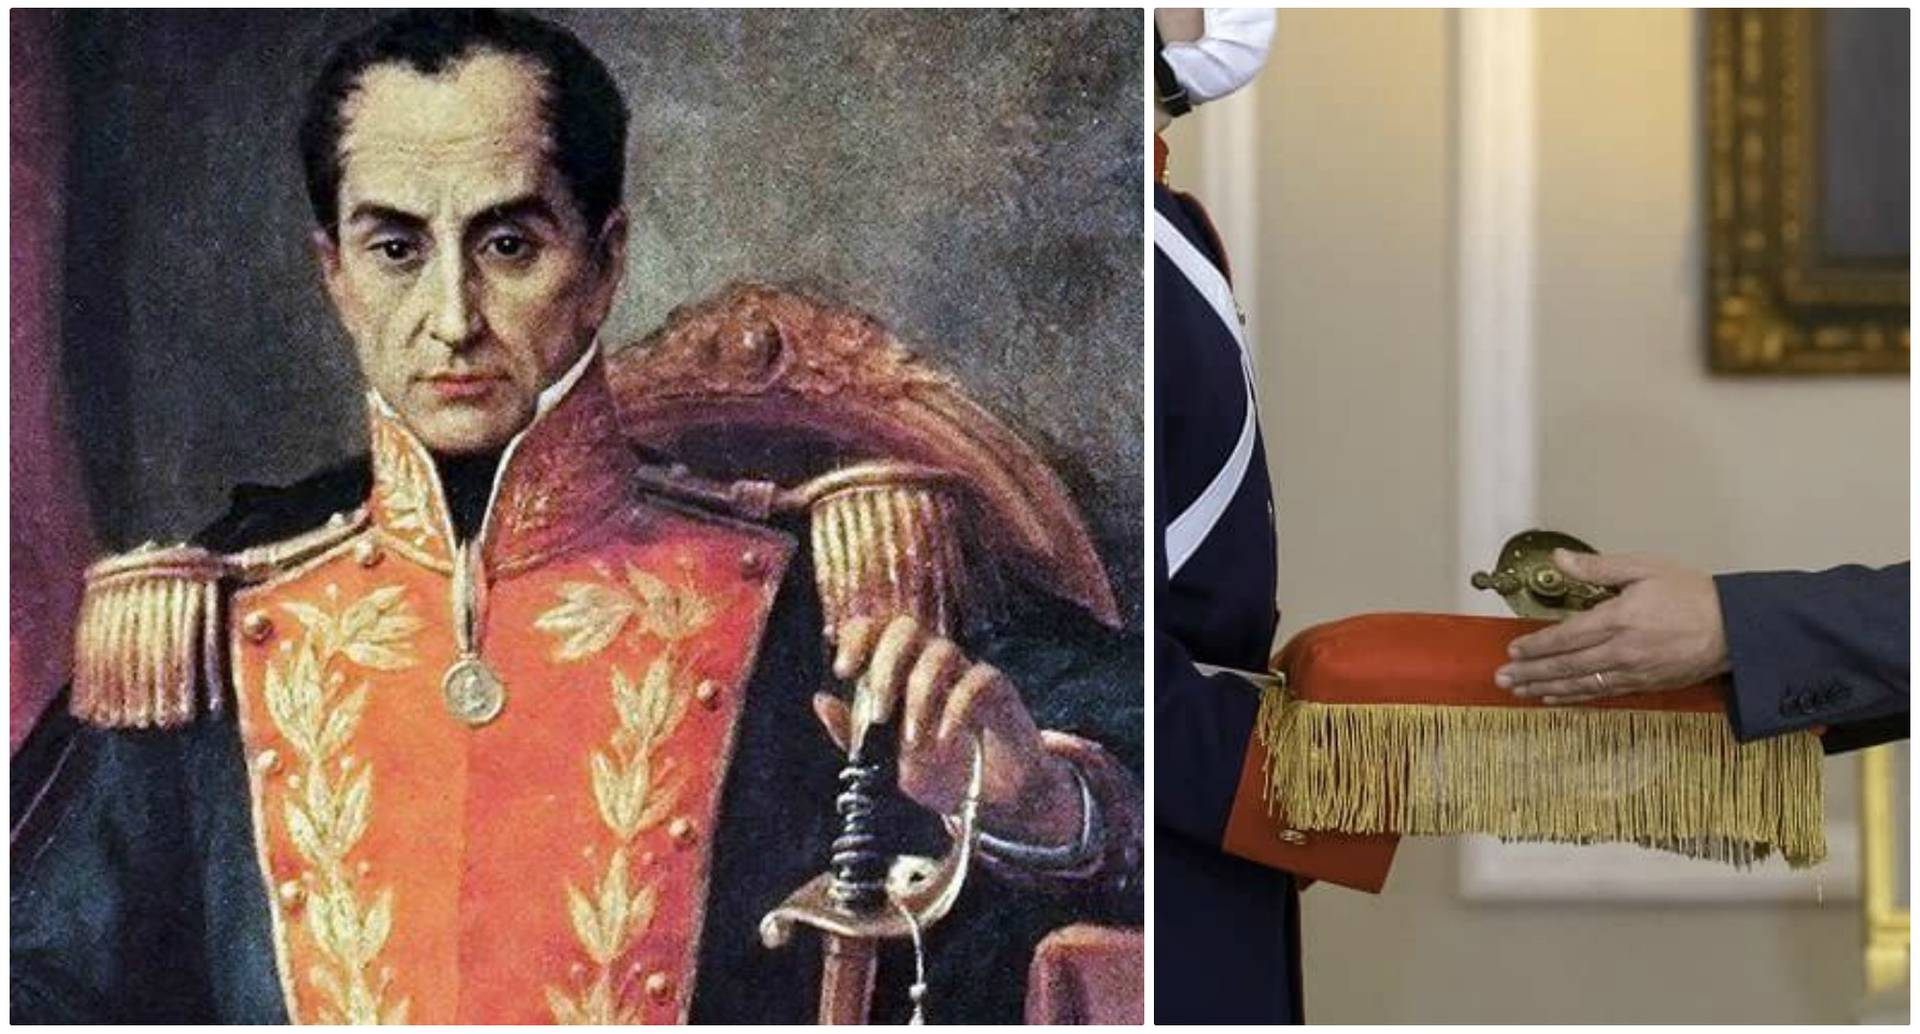 Espada de Simón Bolívar